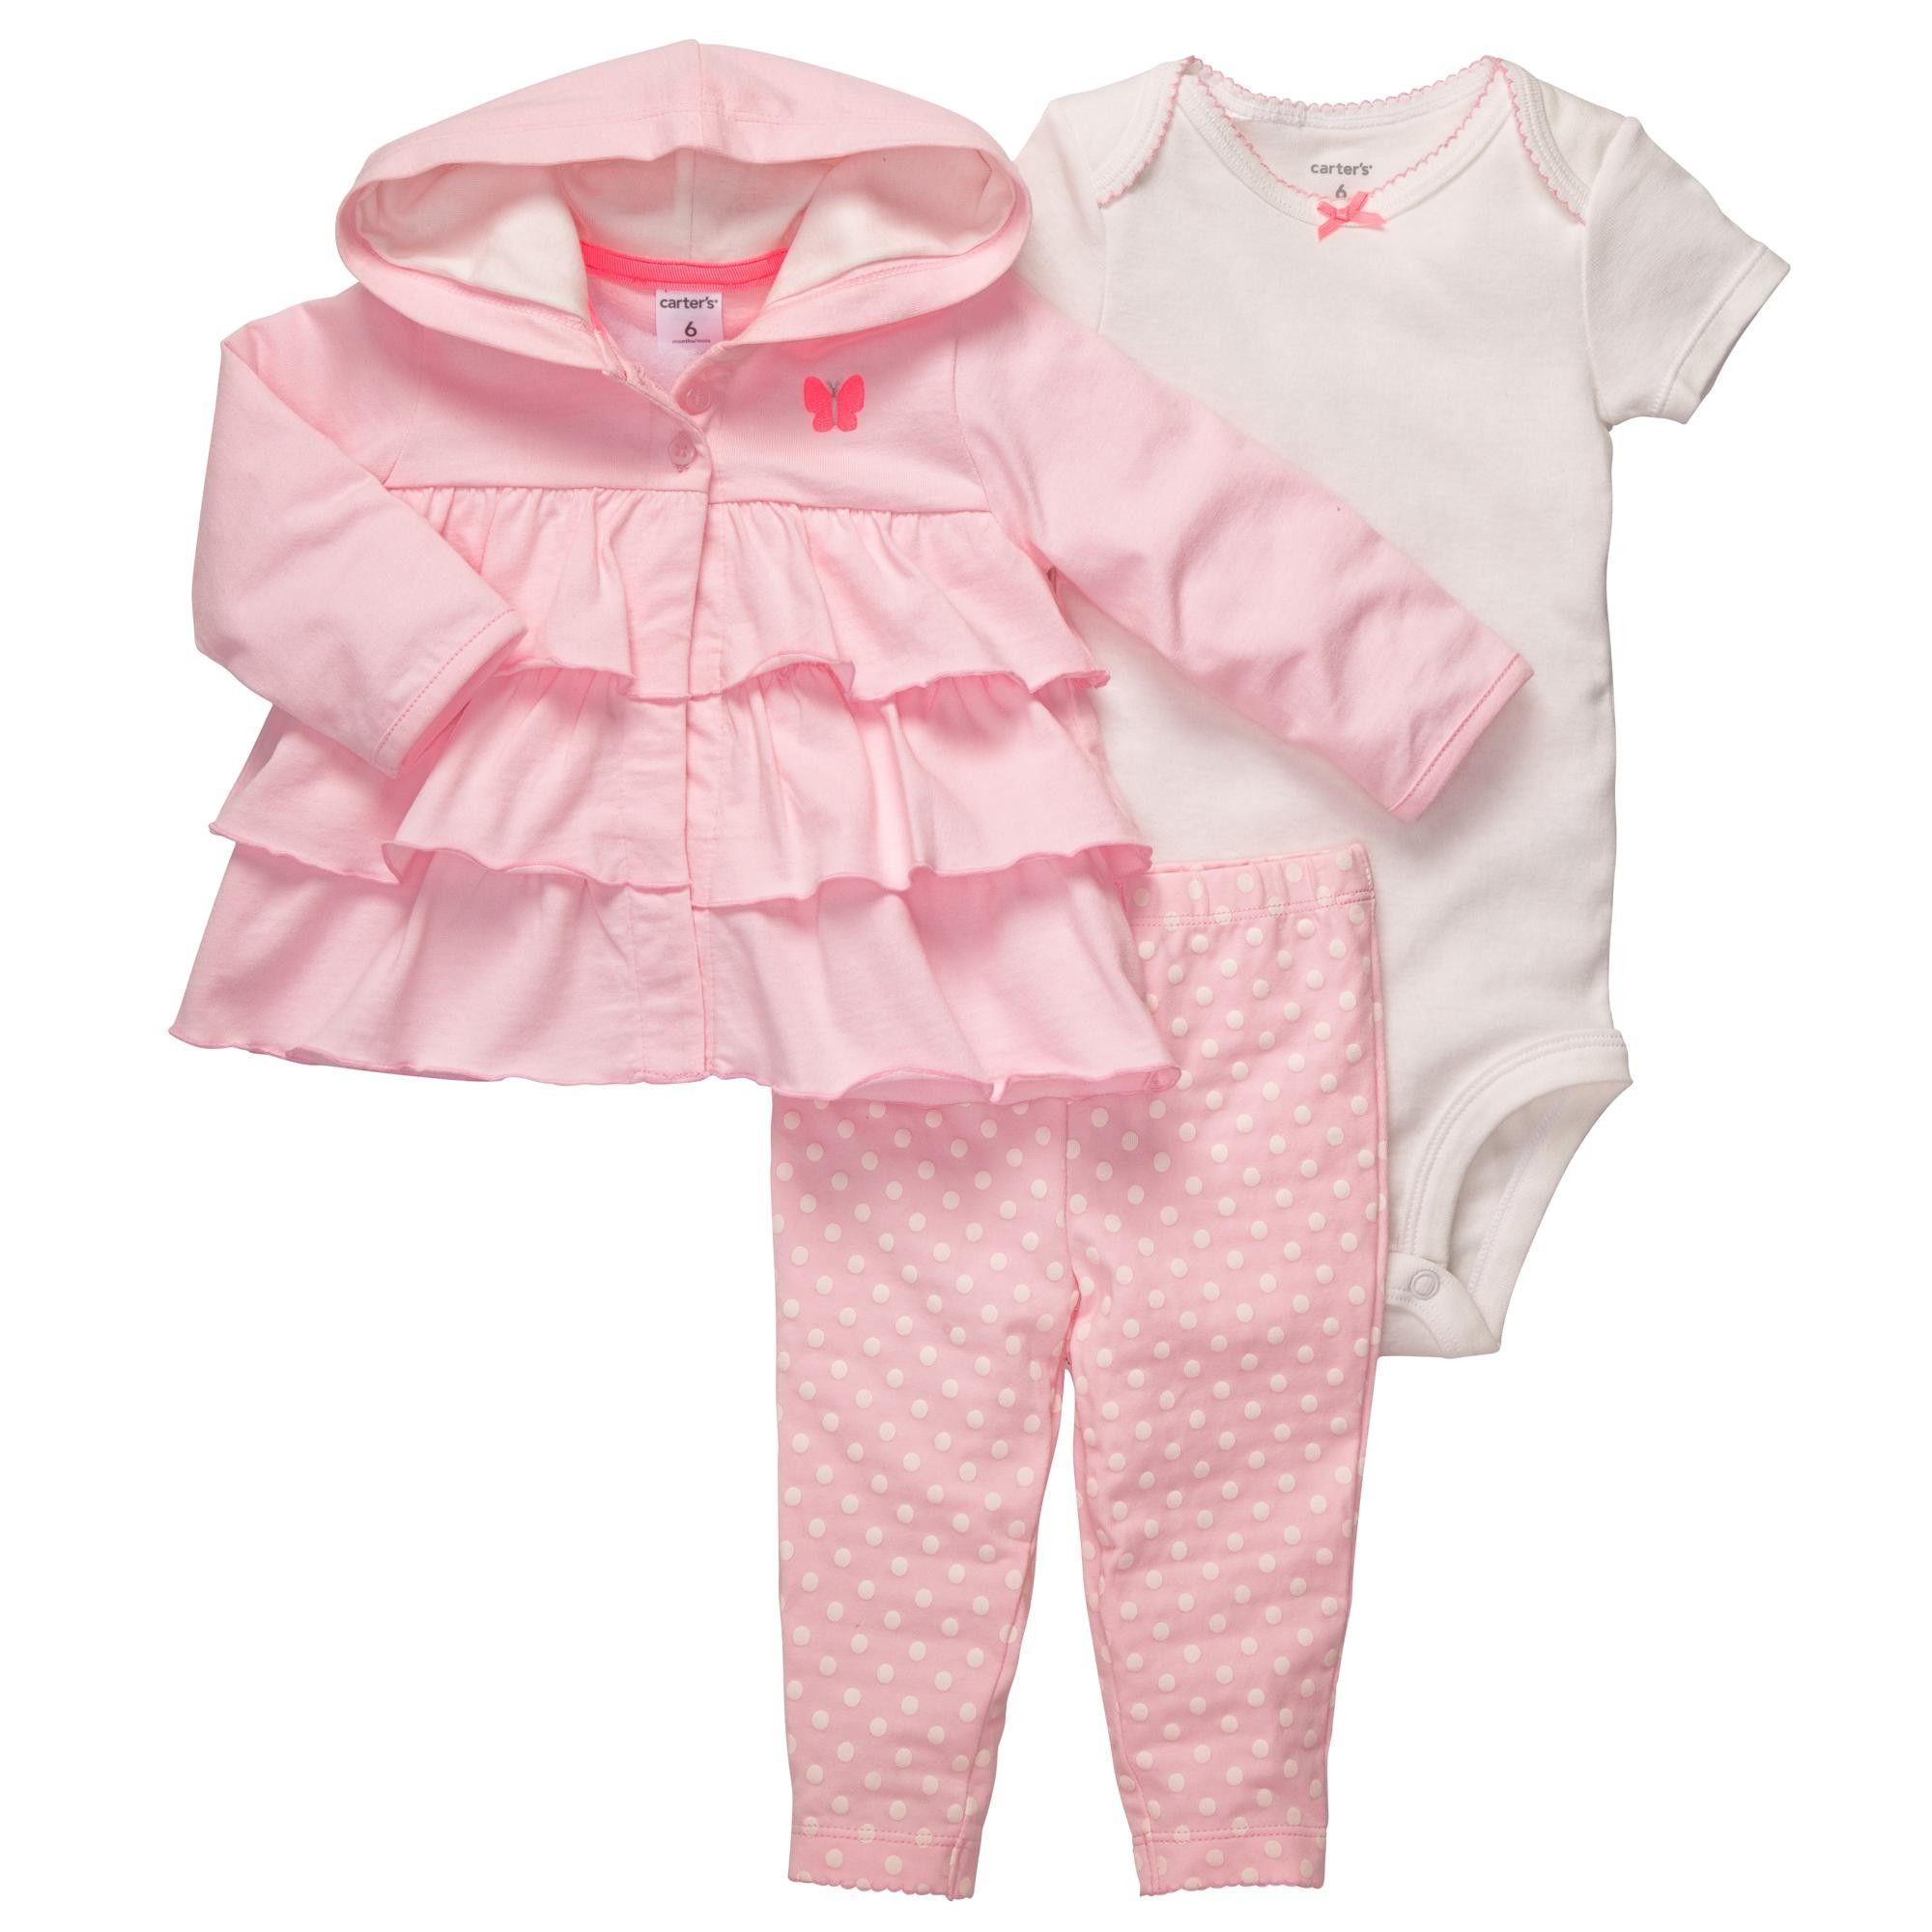 Image result for ropa nina bebe